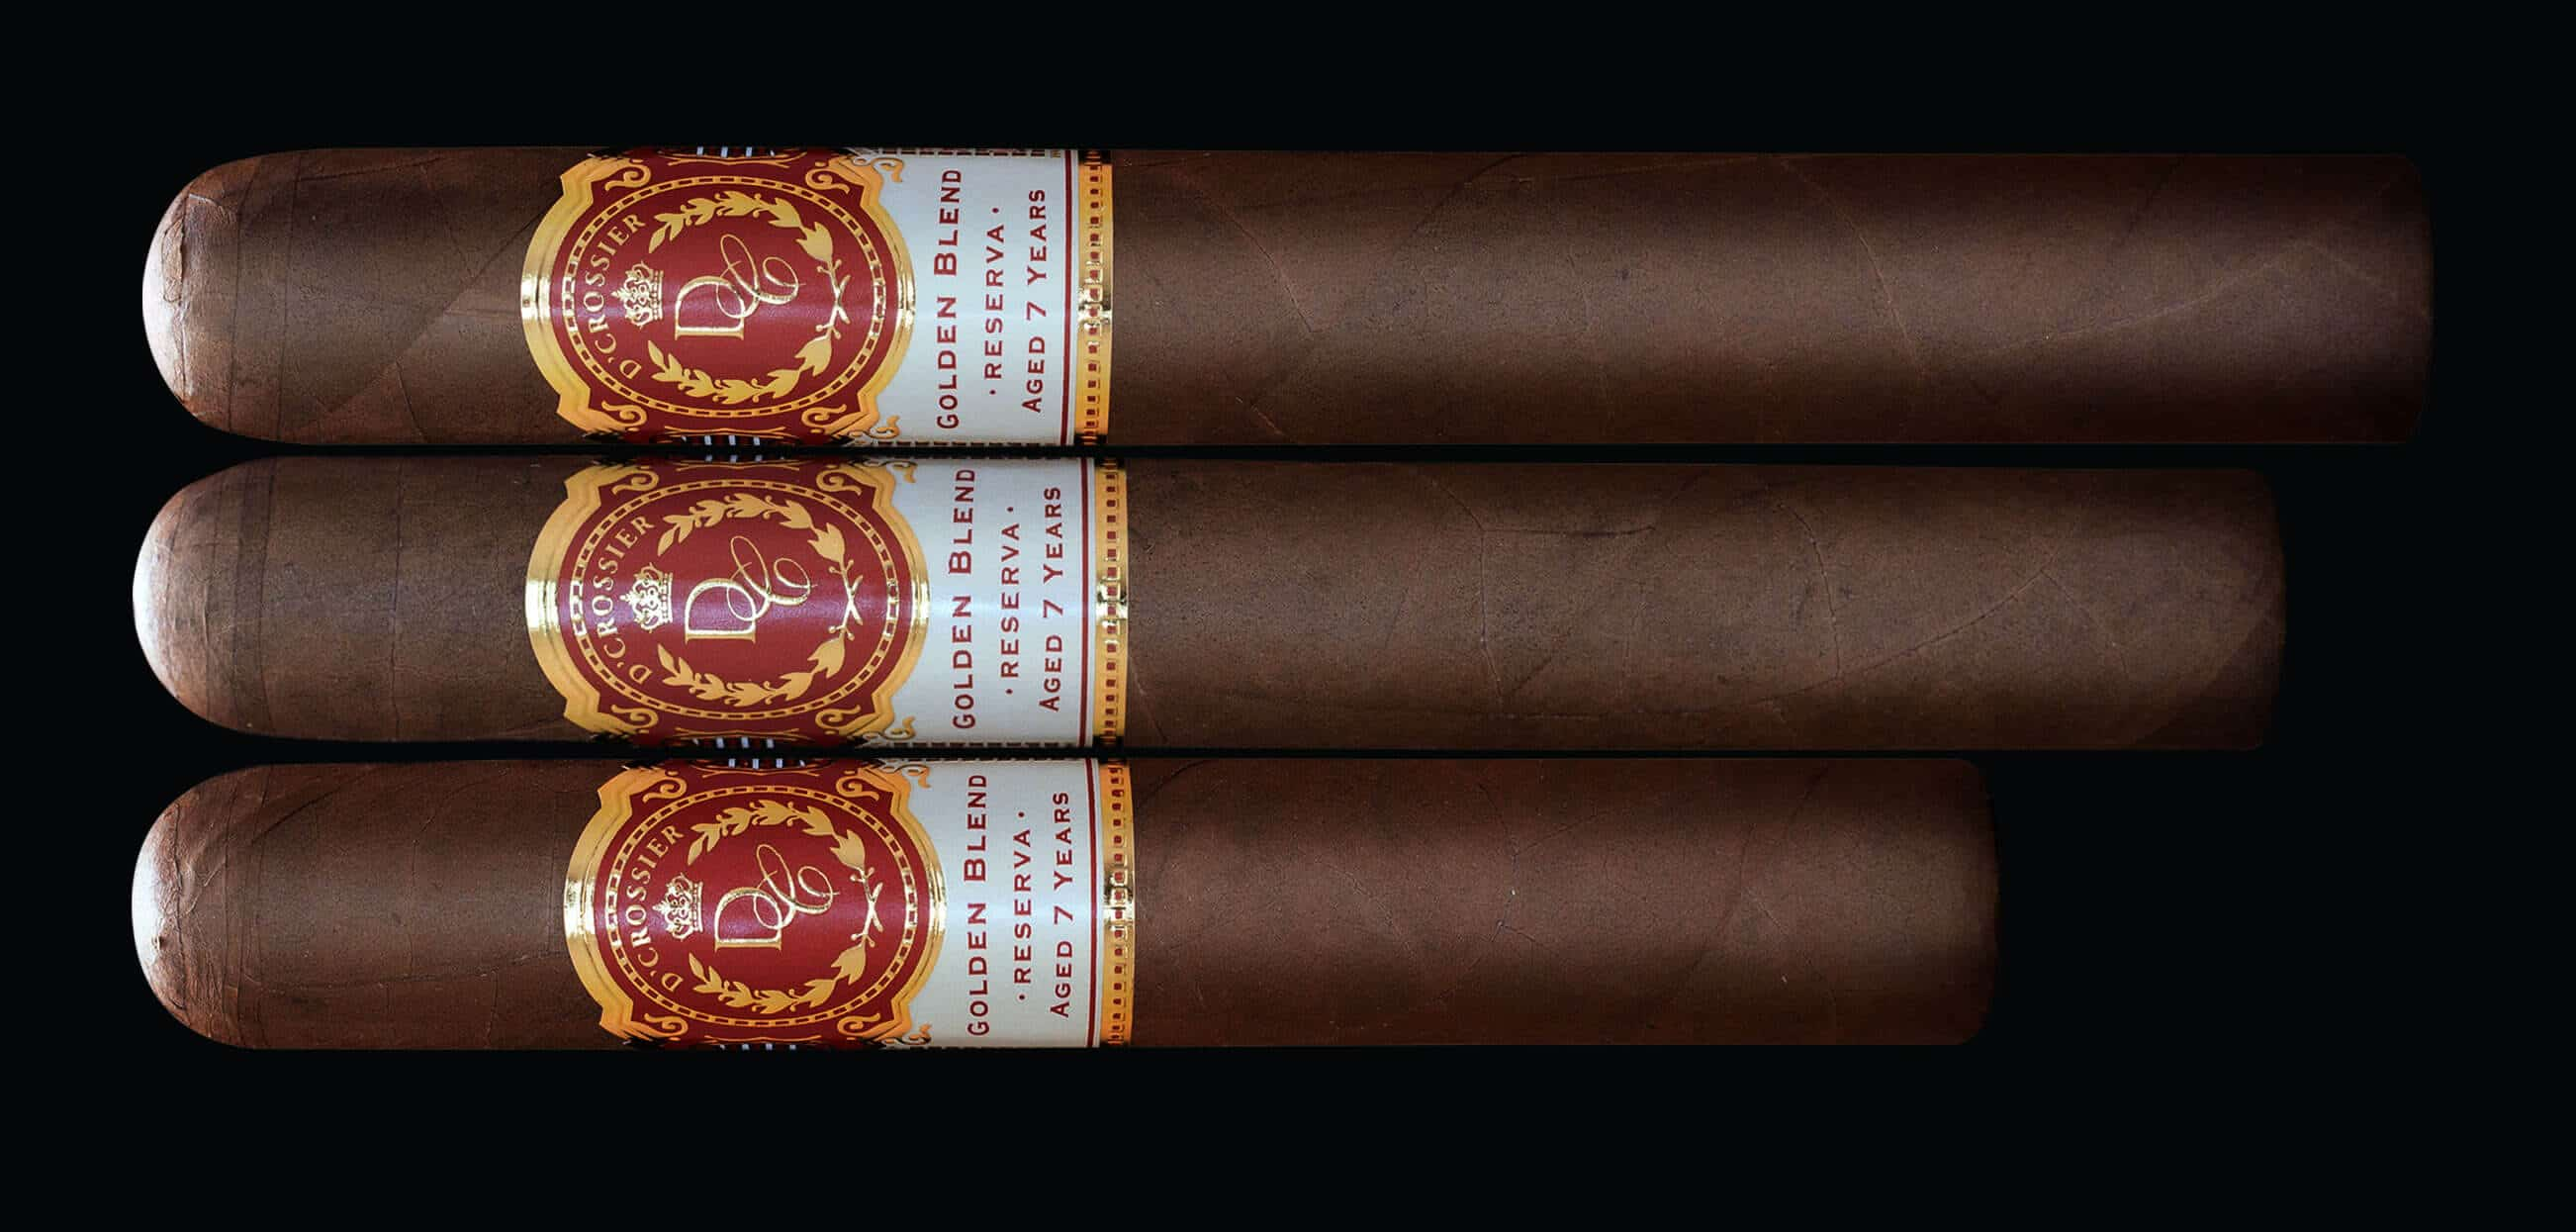 Cigar News: D'Crossier Expands Golden Blend Line with Reserva